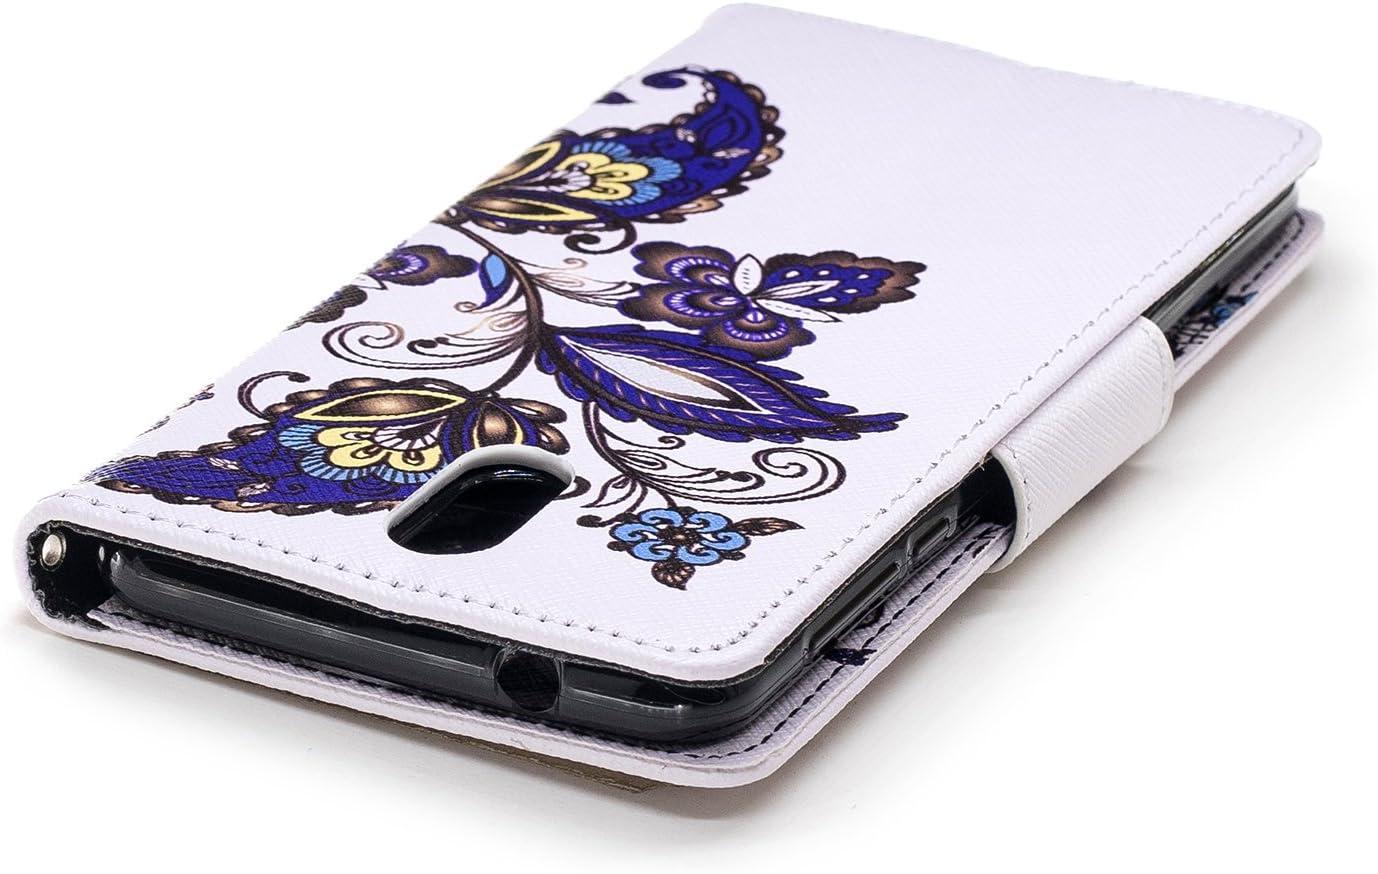 LOBFE13121#1 Nokia 3.1 Case Lomogo Leather Wallet Case with Kickstand Card Holder Shockproof Flip Case Cover for Nokia3.1